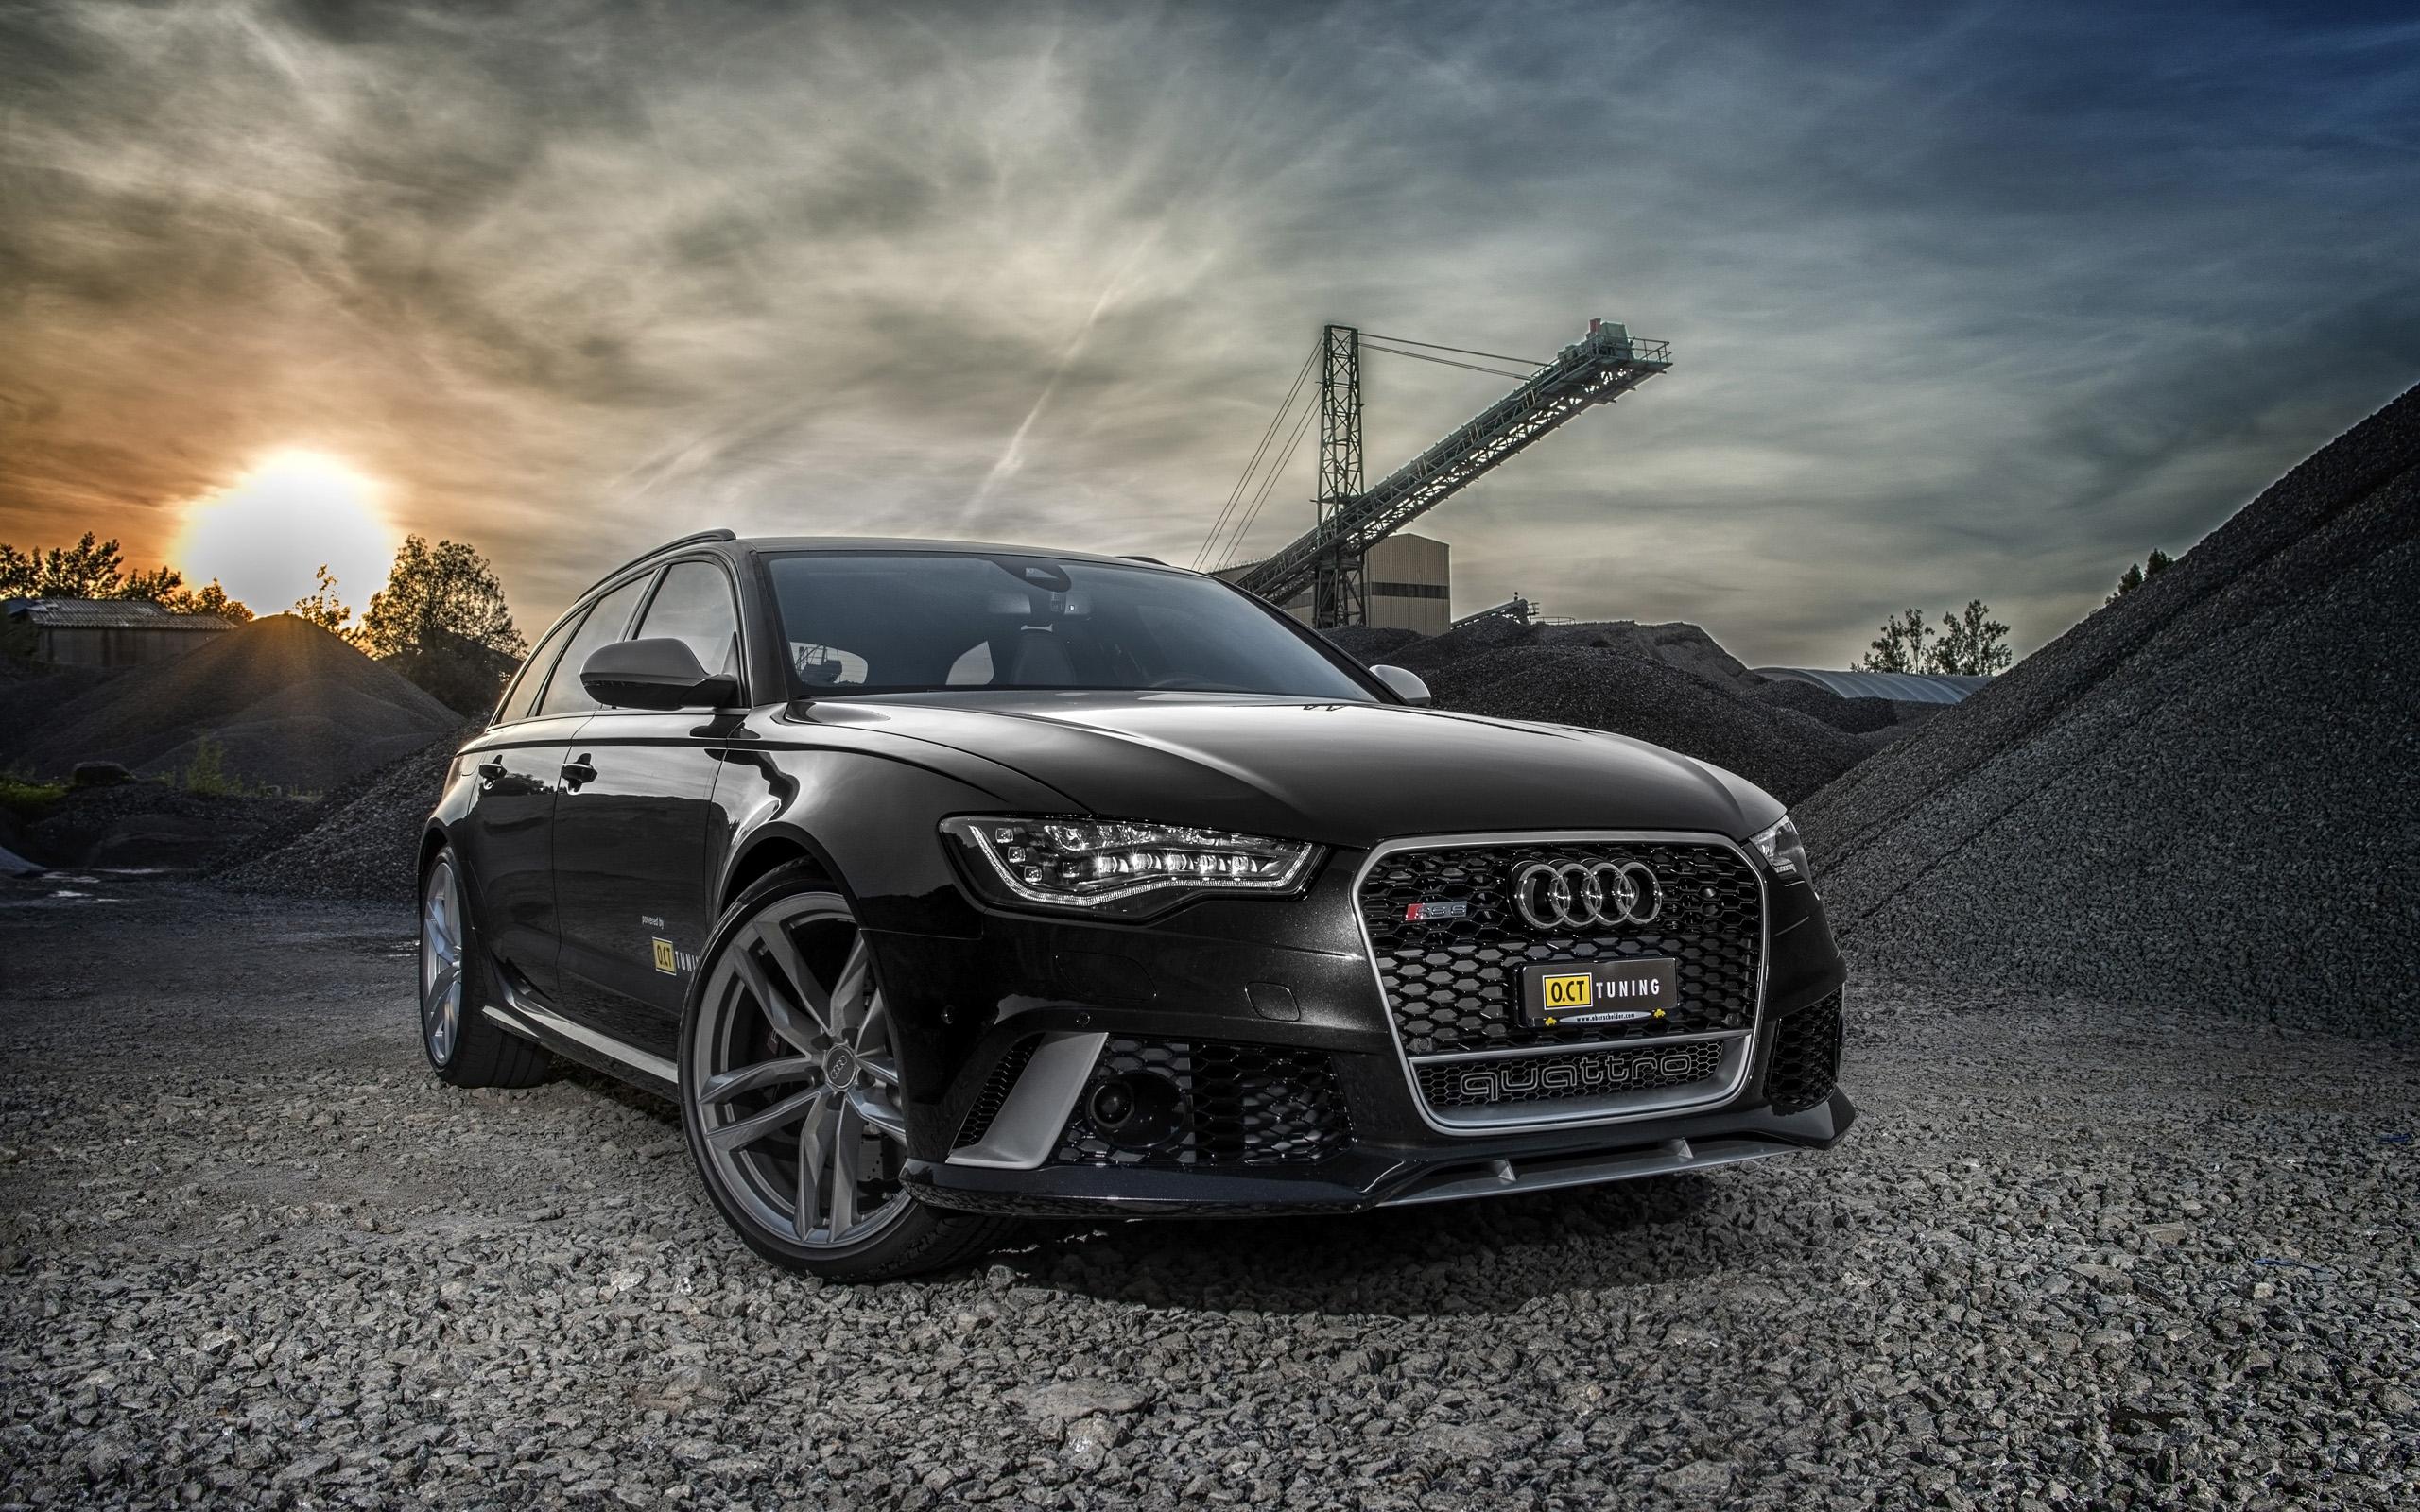 CT Tuning Audi RS6 Wallpaper HD Car Wallpapers 2560x1600